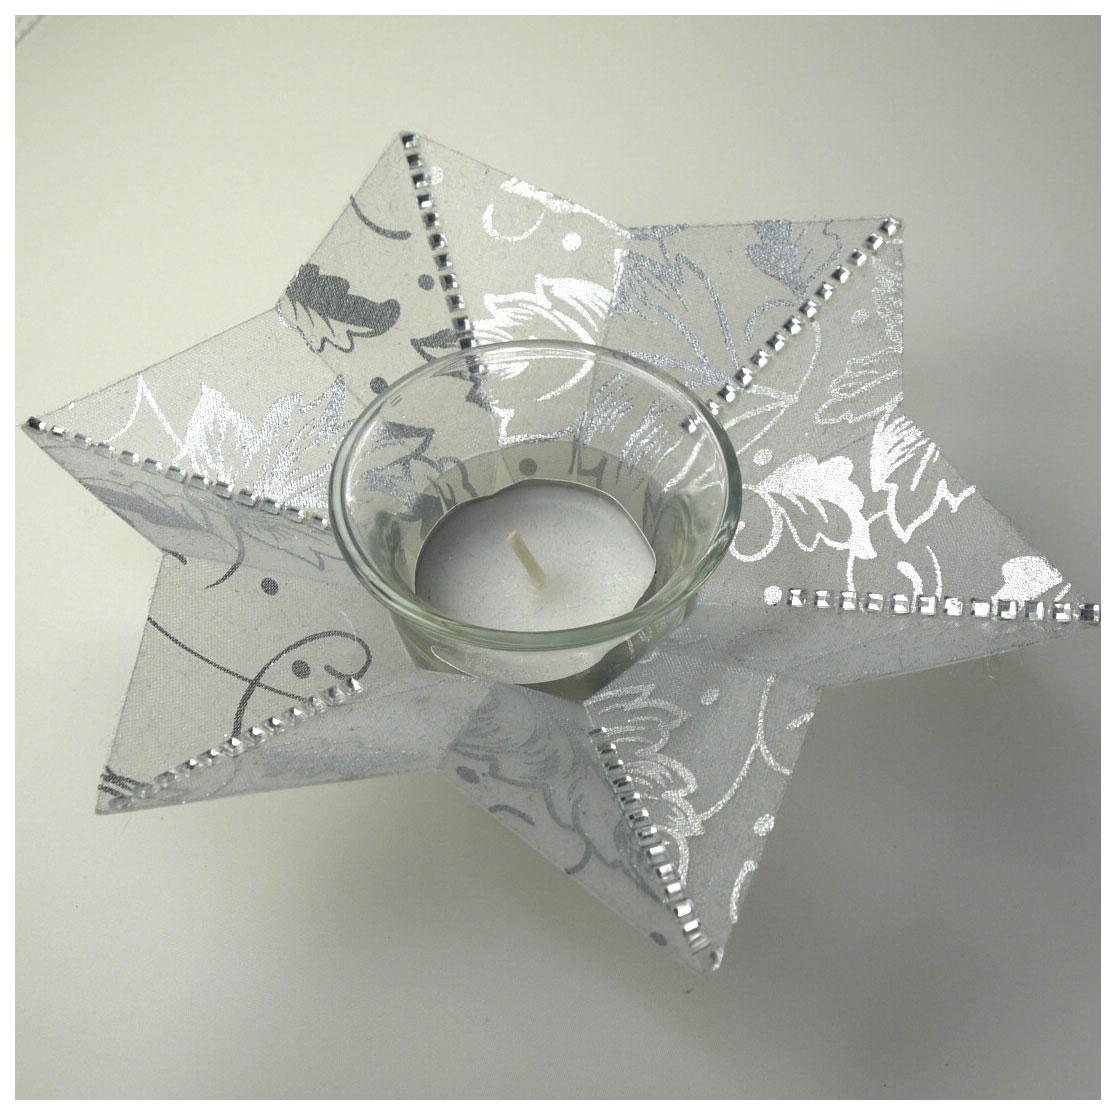 Création CréaPop Hobbyfun avec tissu vlies hobbyfun